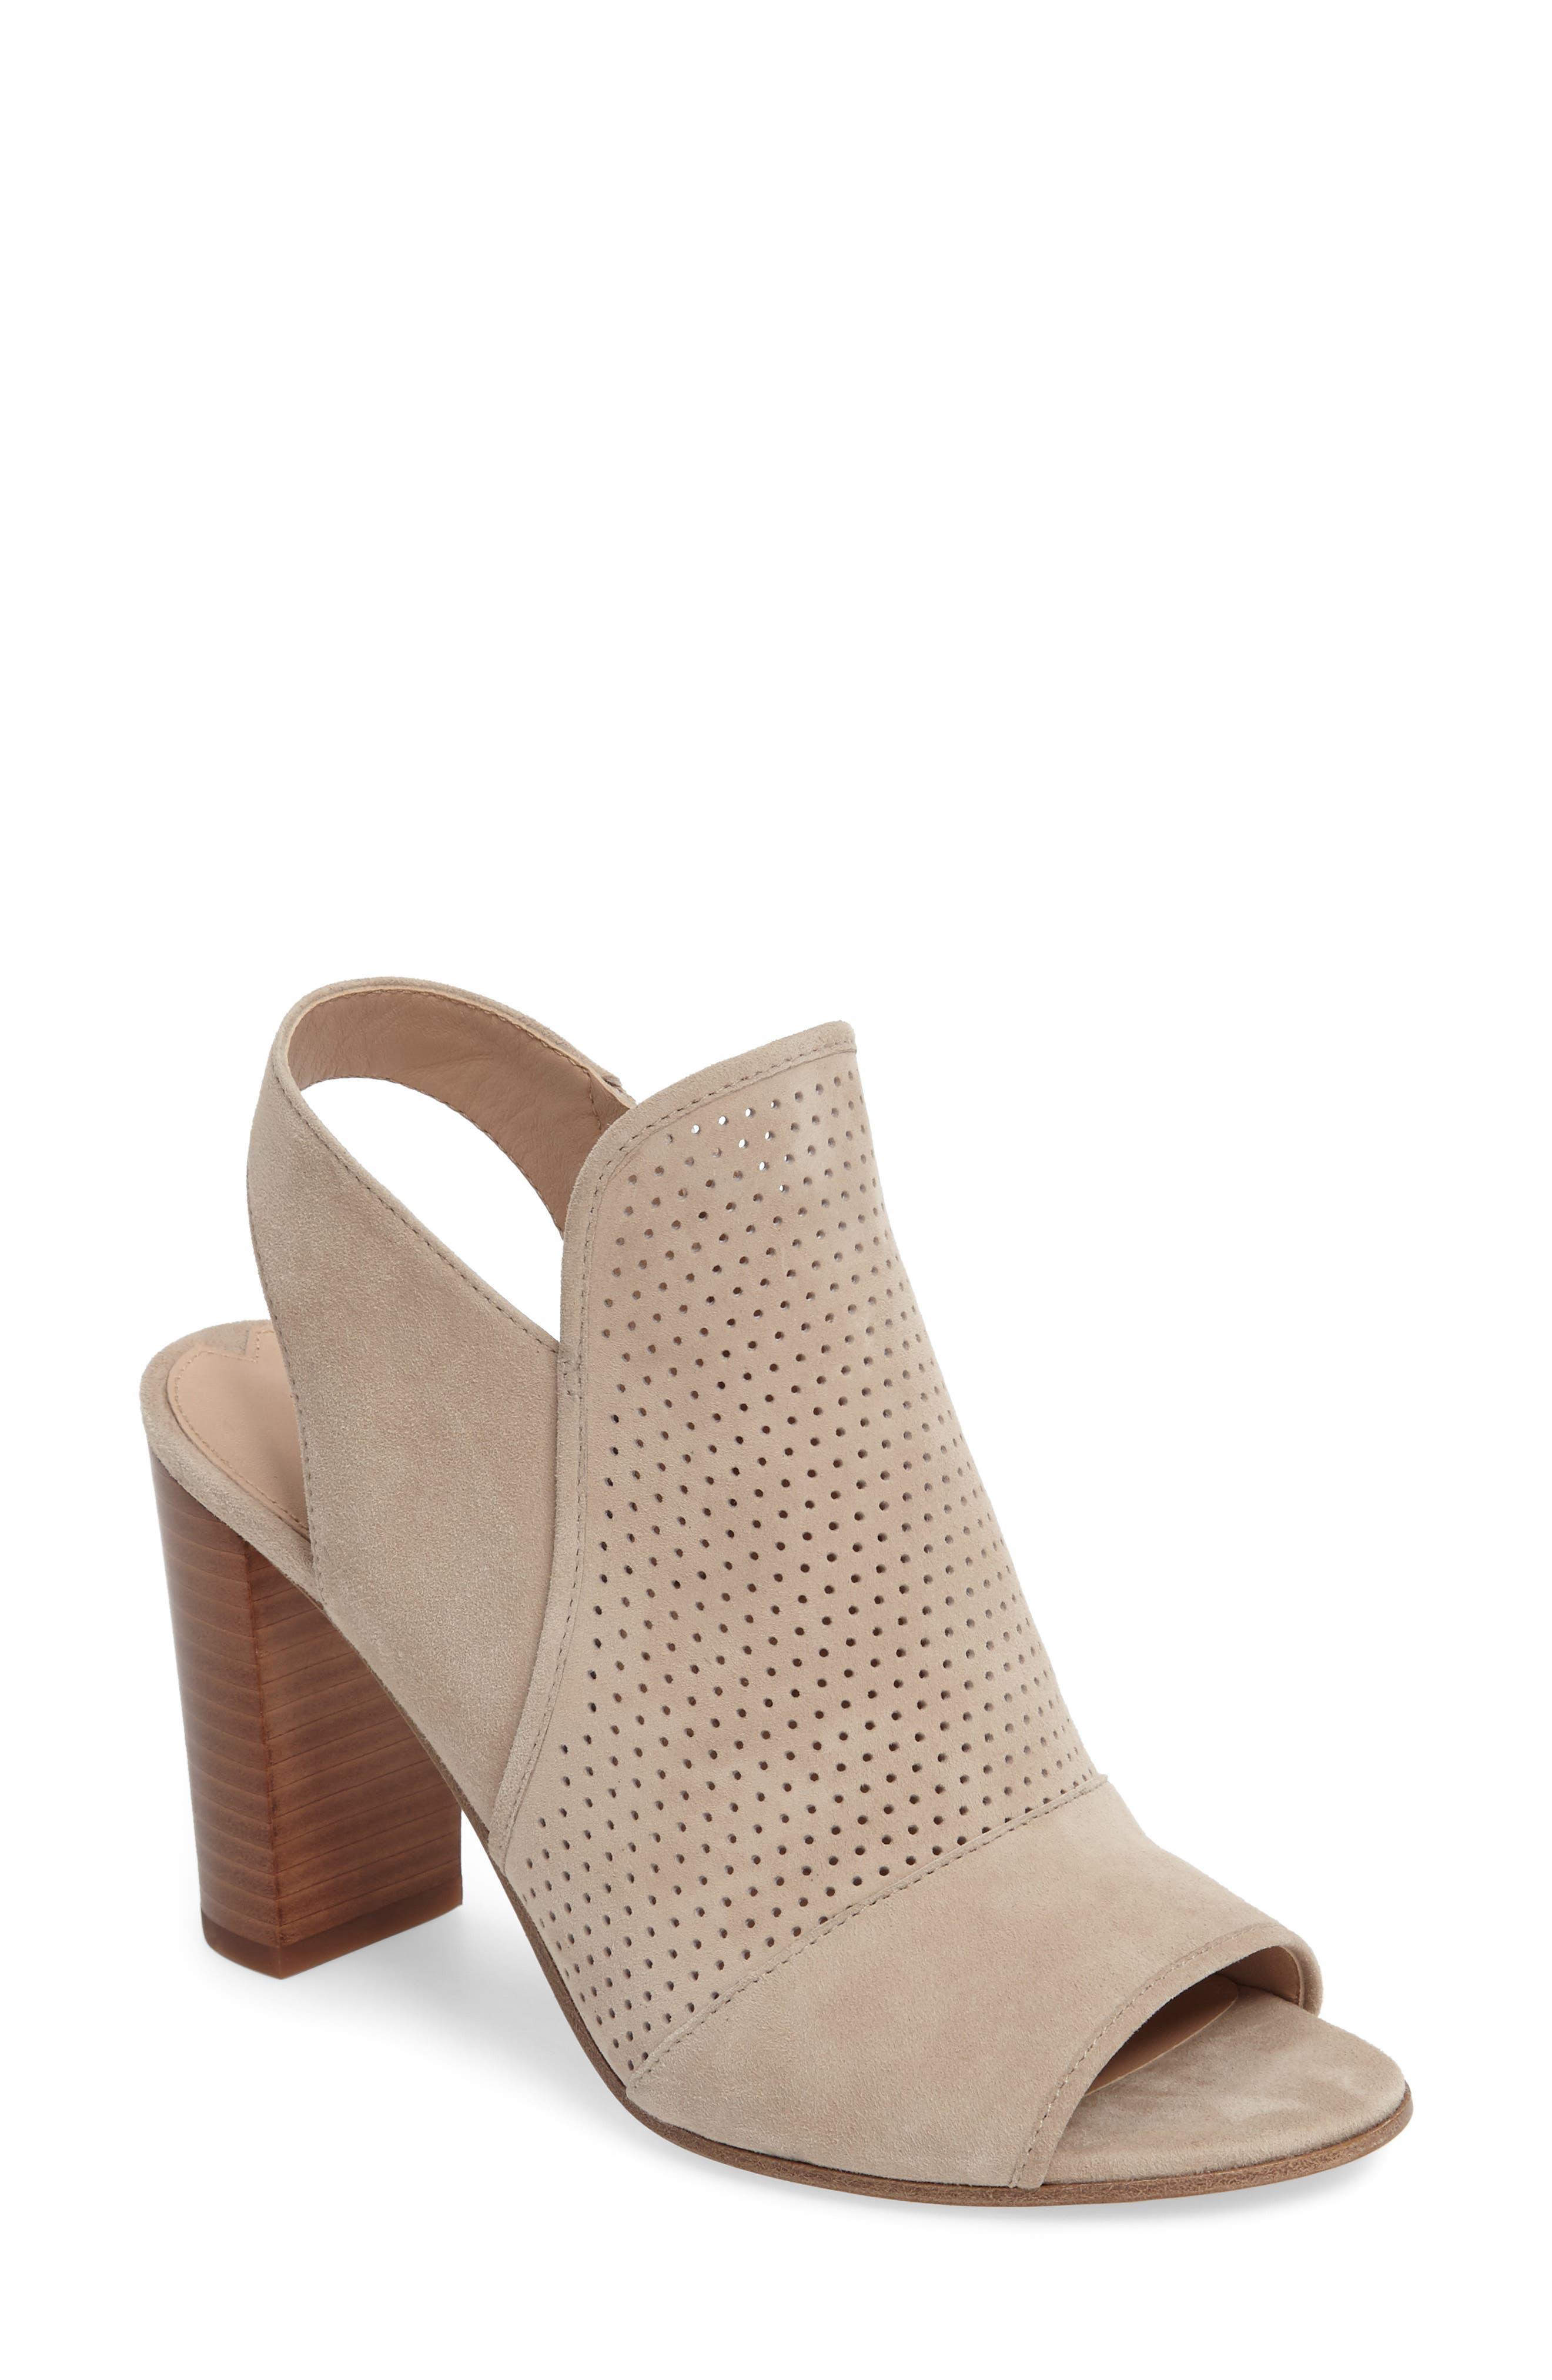 Main Image - Via Spiga Gaze Block Heel Sandal (Women)